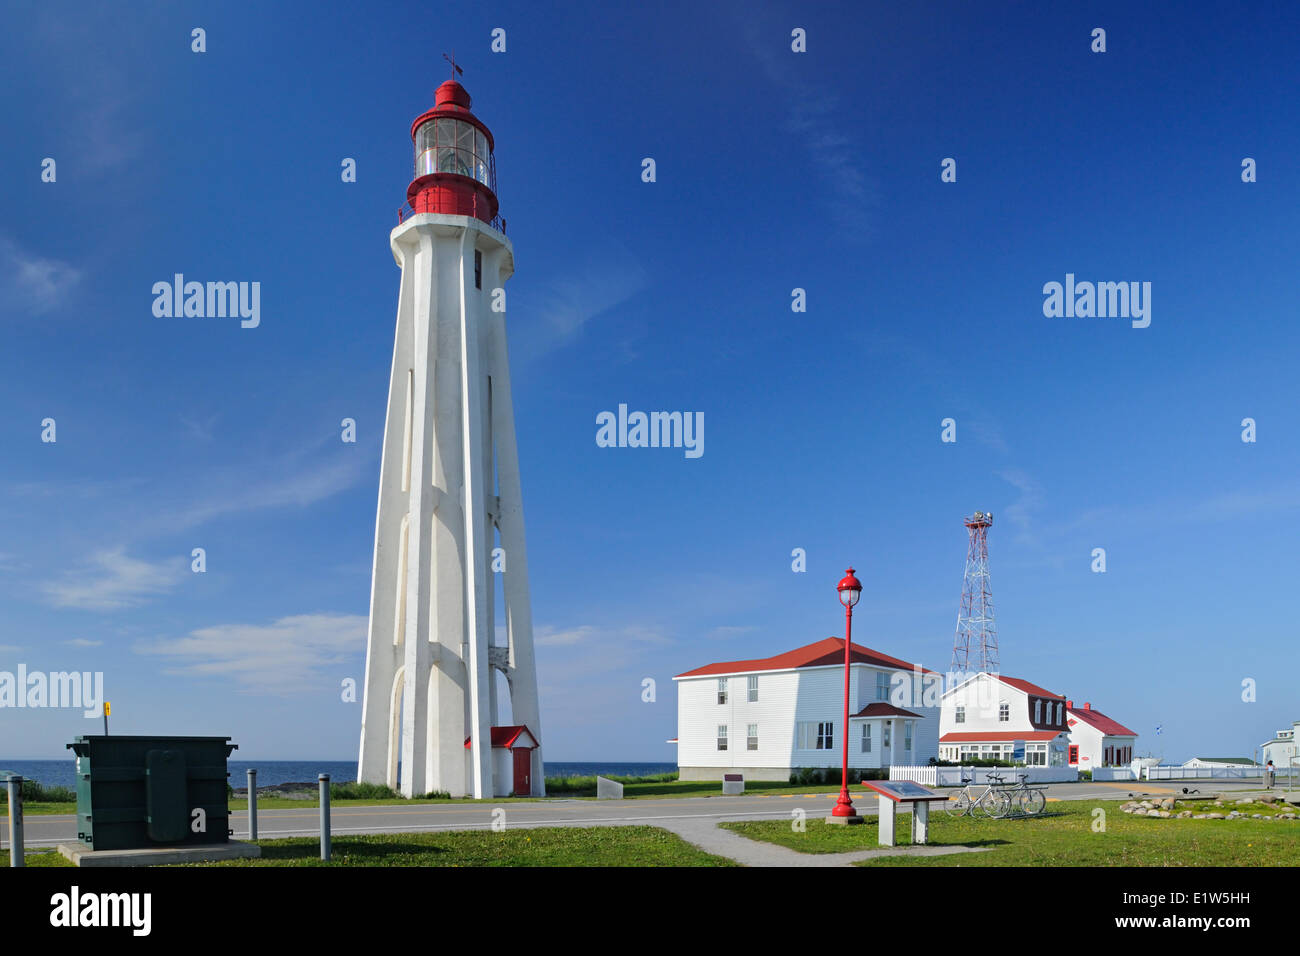 Pointe-au-Père Lighthouse National Historic Site of Canada, Quebec - Stock Image